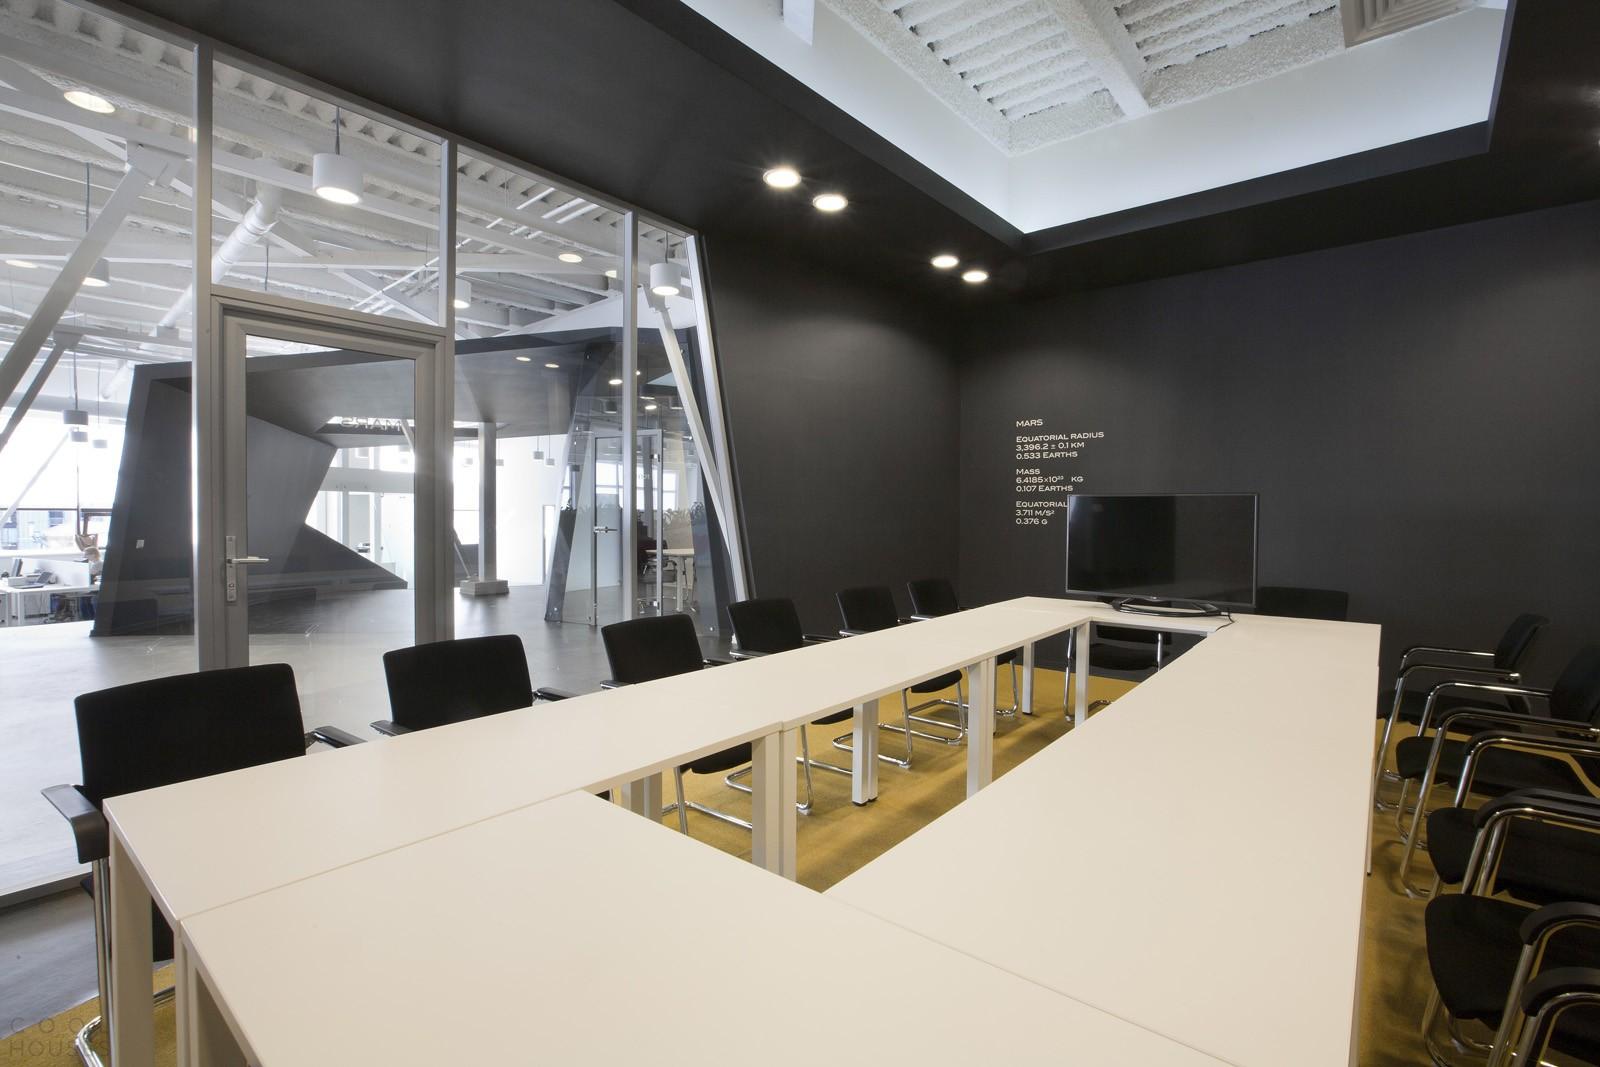 Офис компании Iponweb в бизнес-центре «Шаболовка 31»